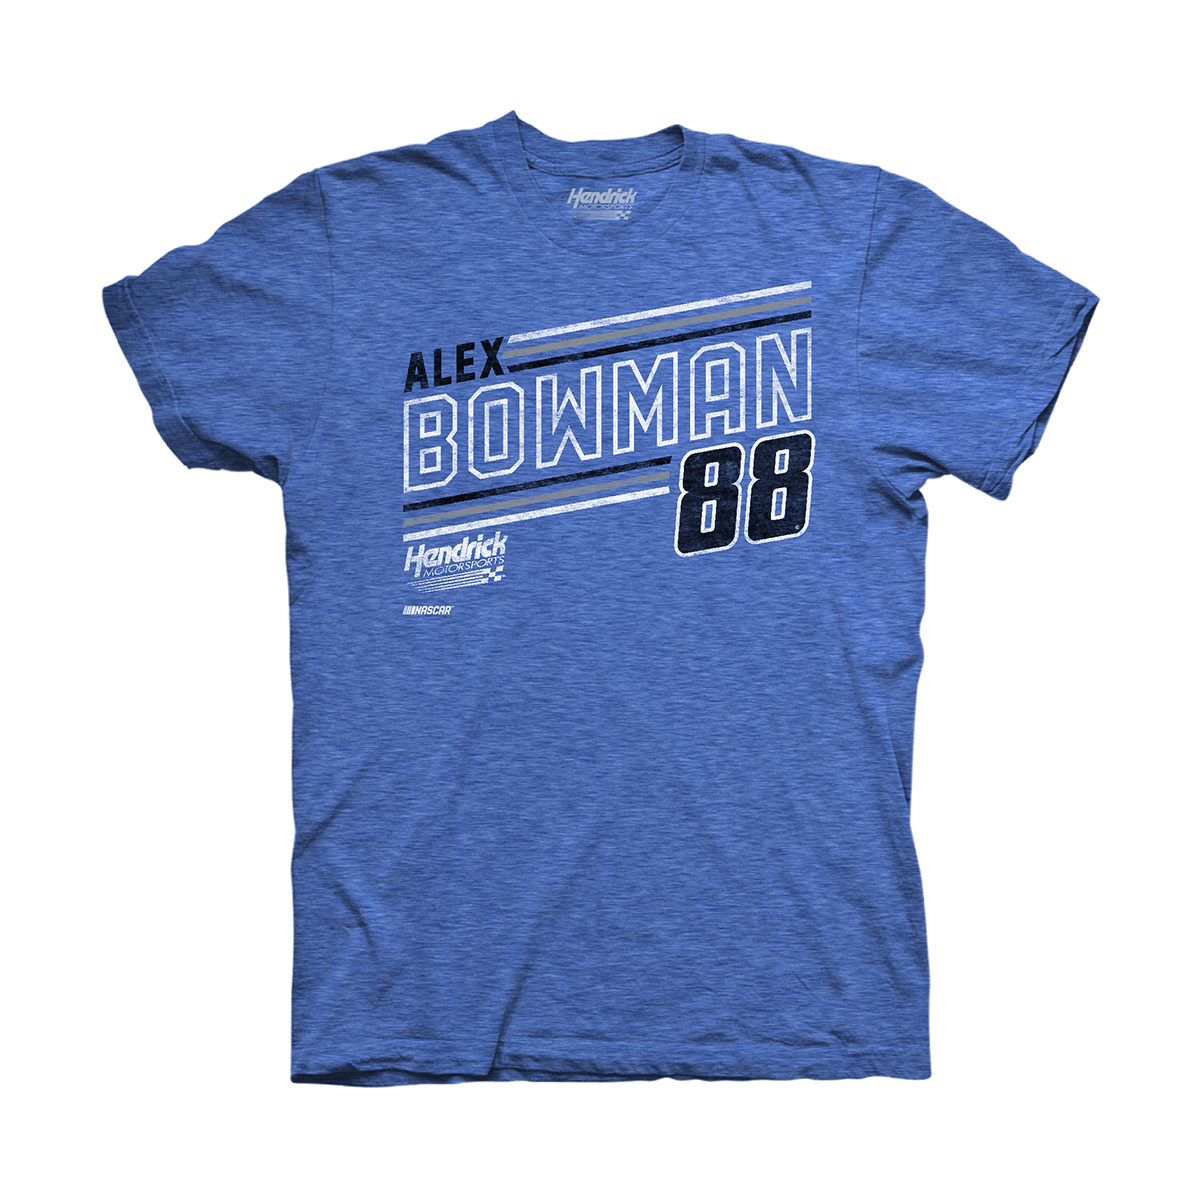 Alex Bowman #88 Vintage T-shirt